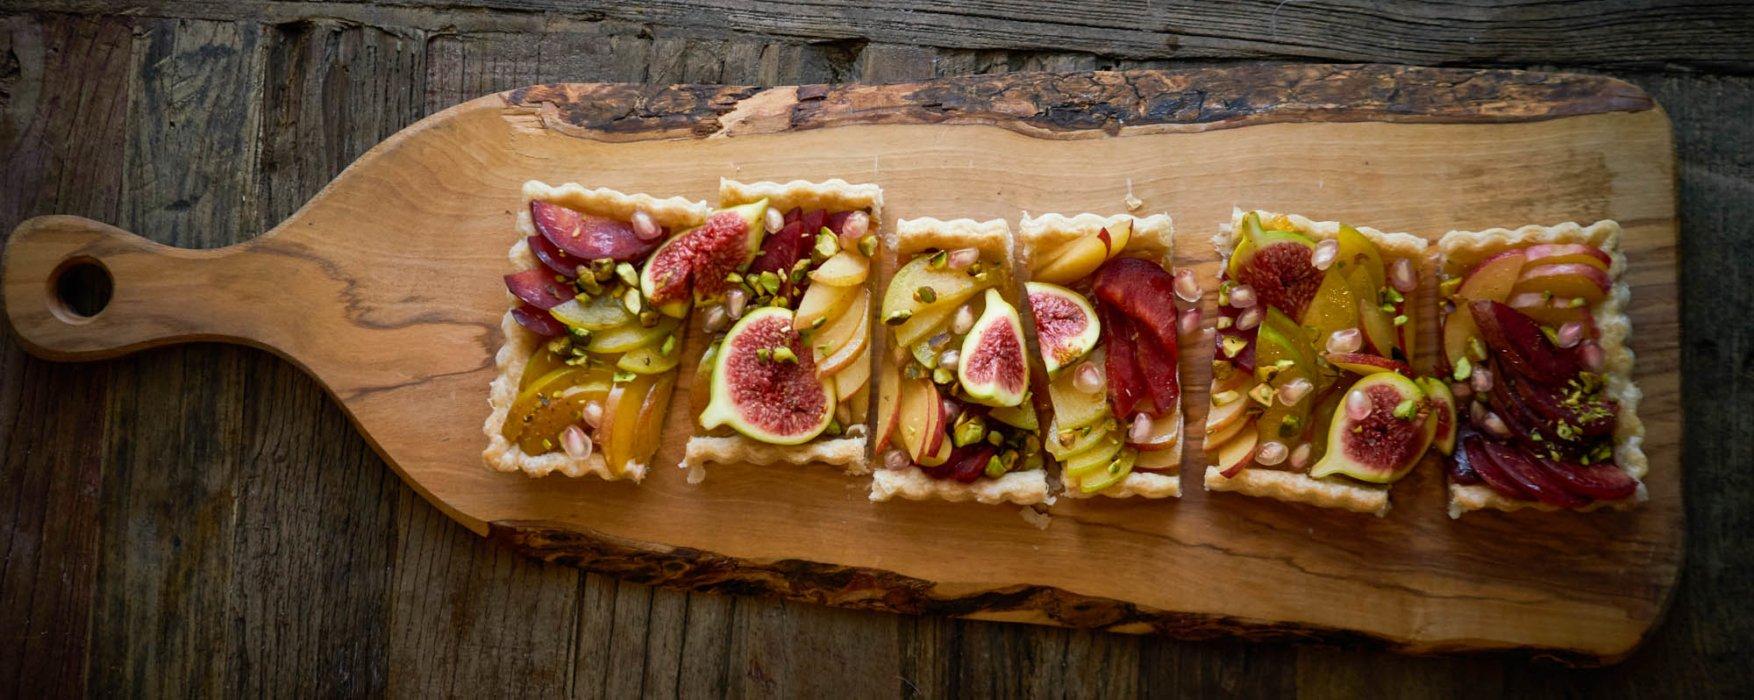 A tart on a rustic cutting board - fine art